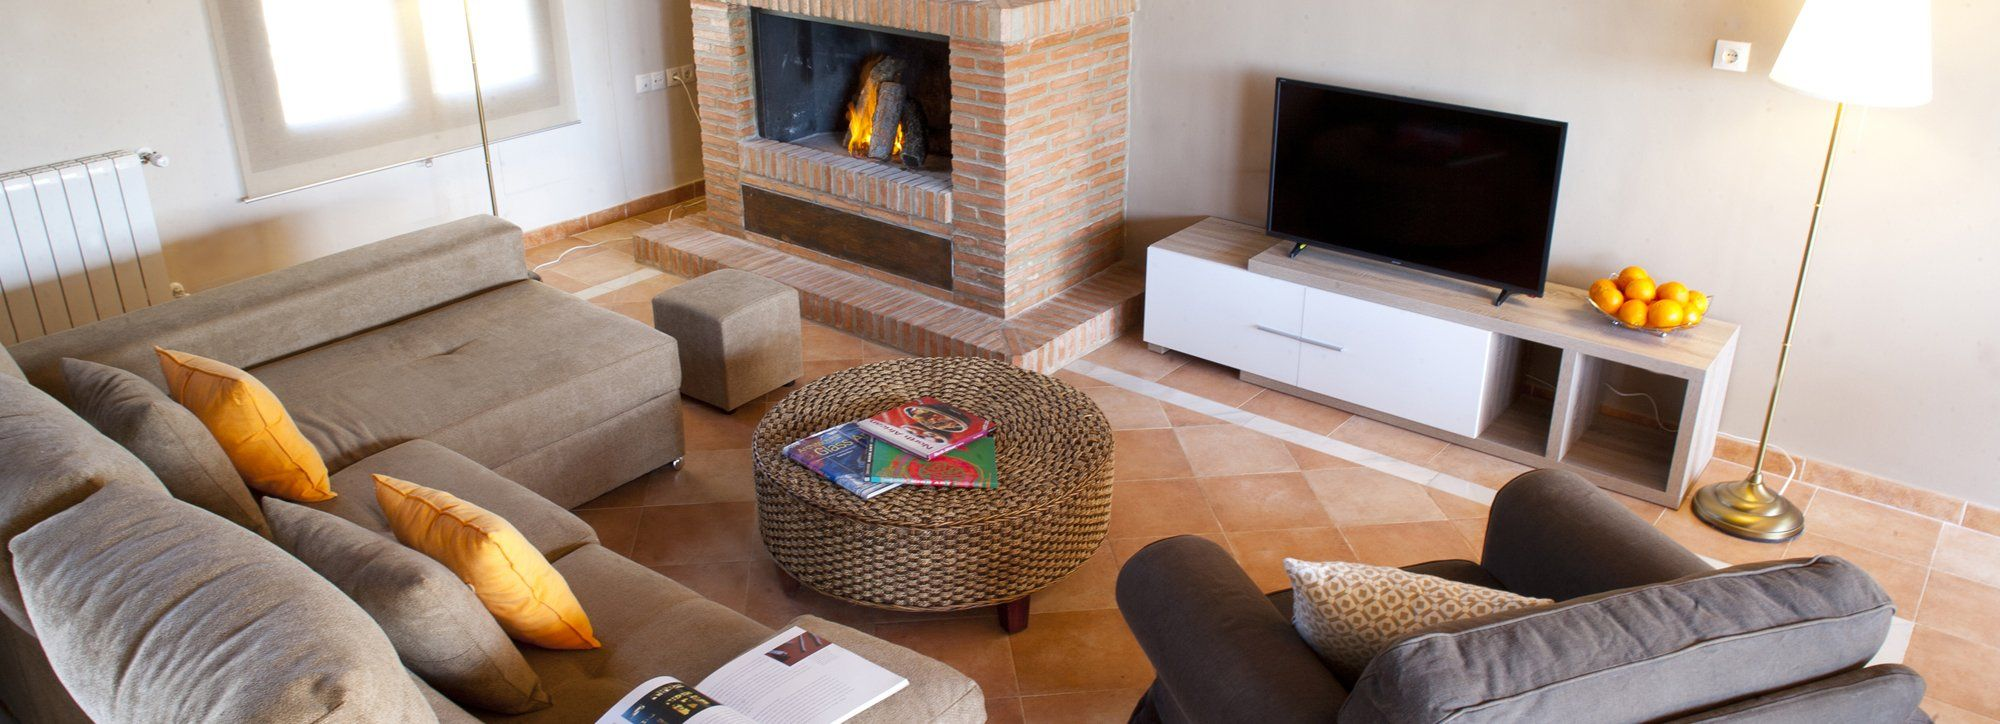 sitting room villa ronda